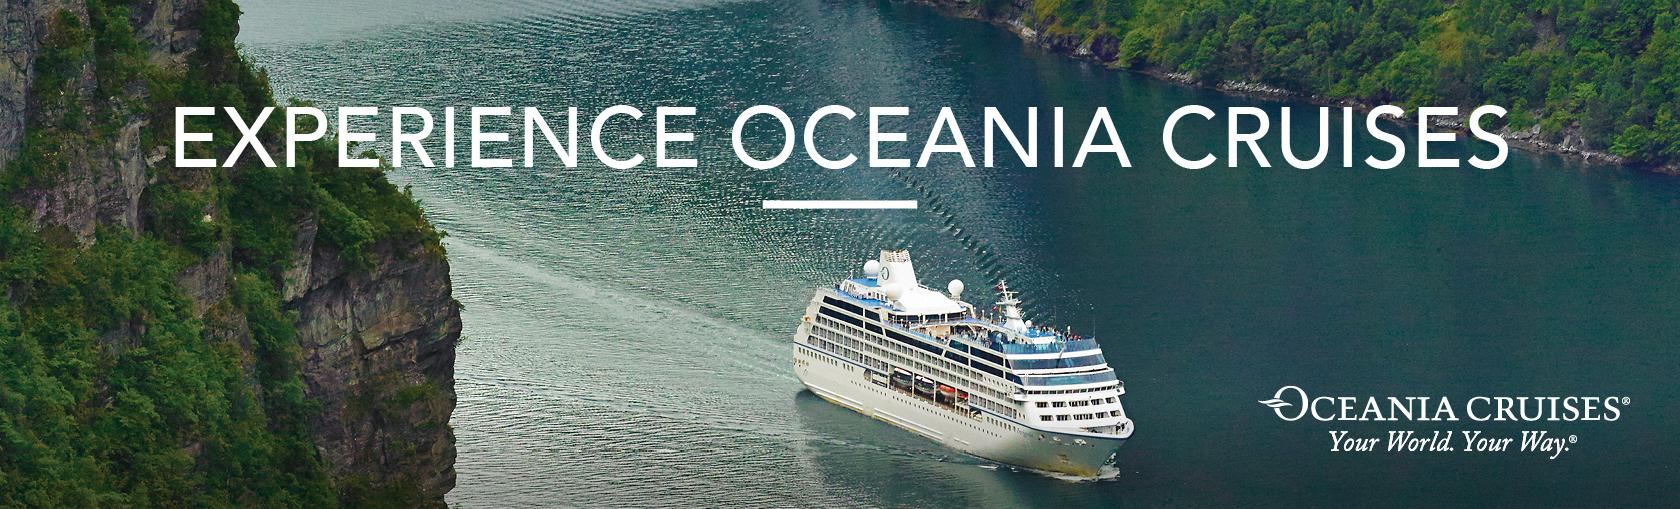 TA CampaignOctober Oceana